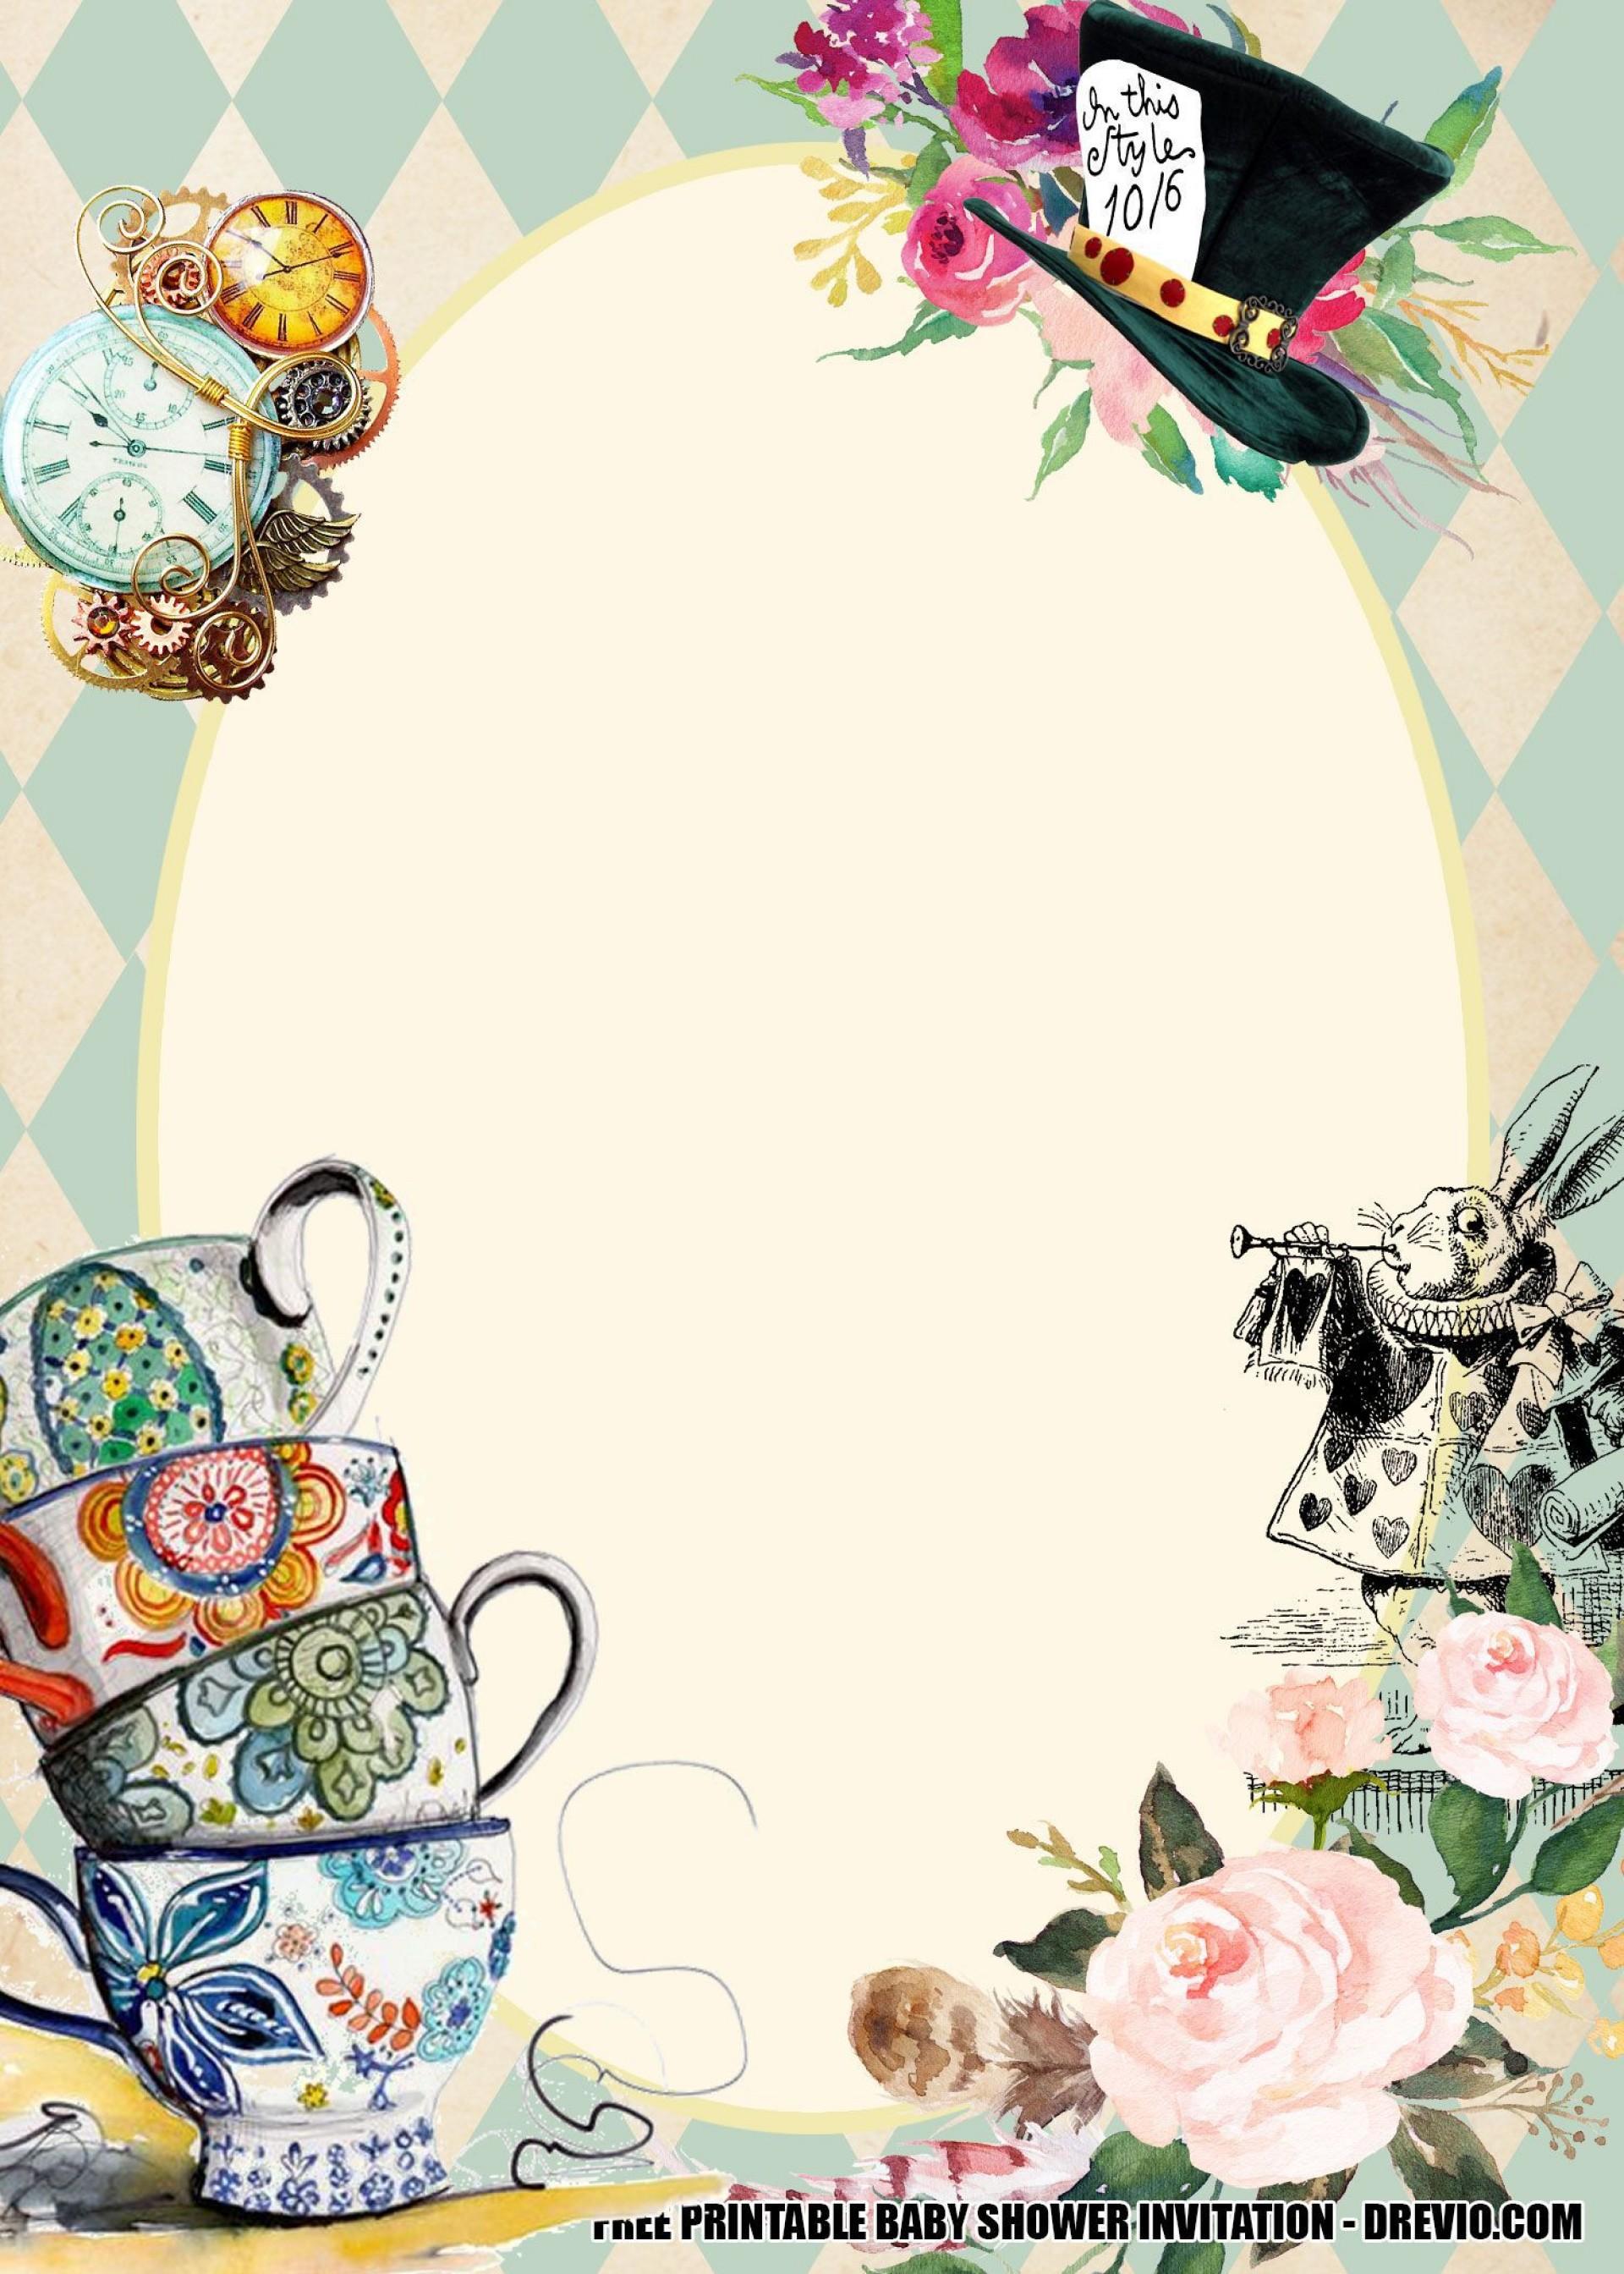 001 Singular Alice In Wonderland Invite Template High Resolution  Party Invitation Free1920